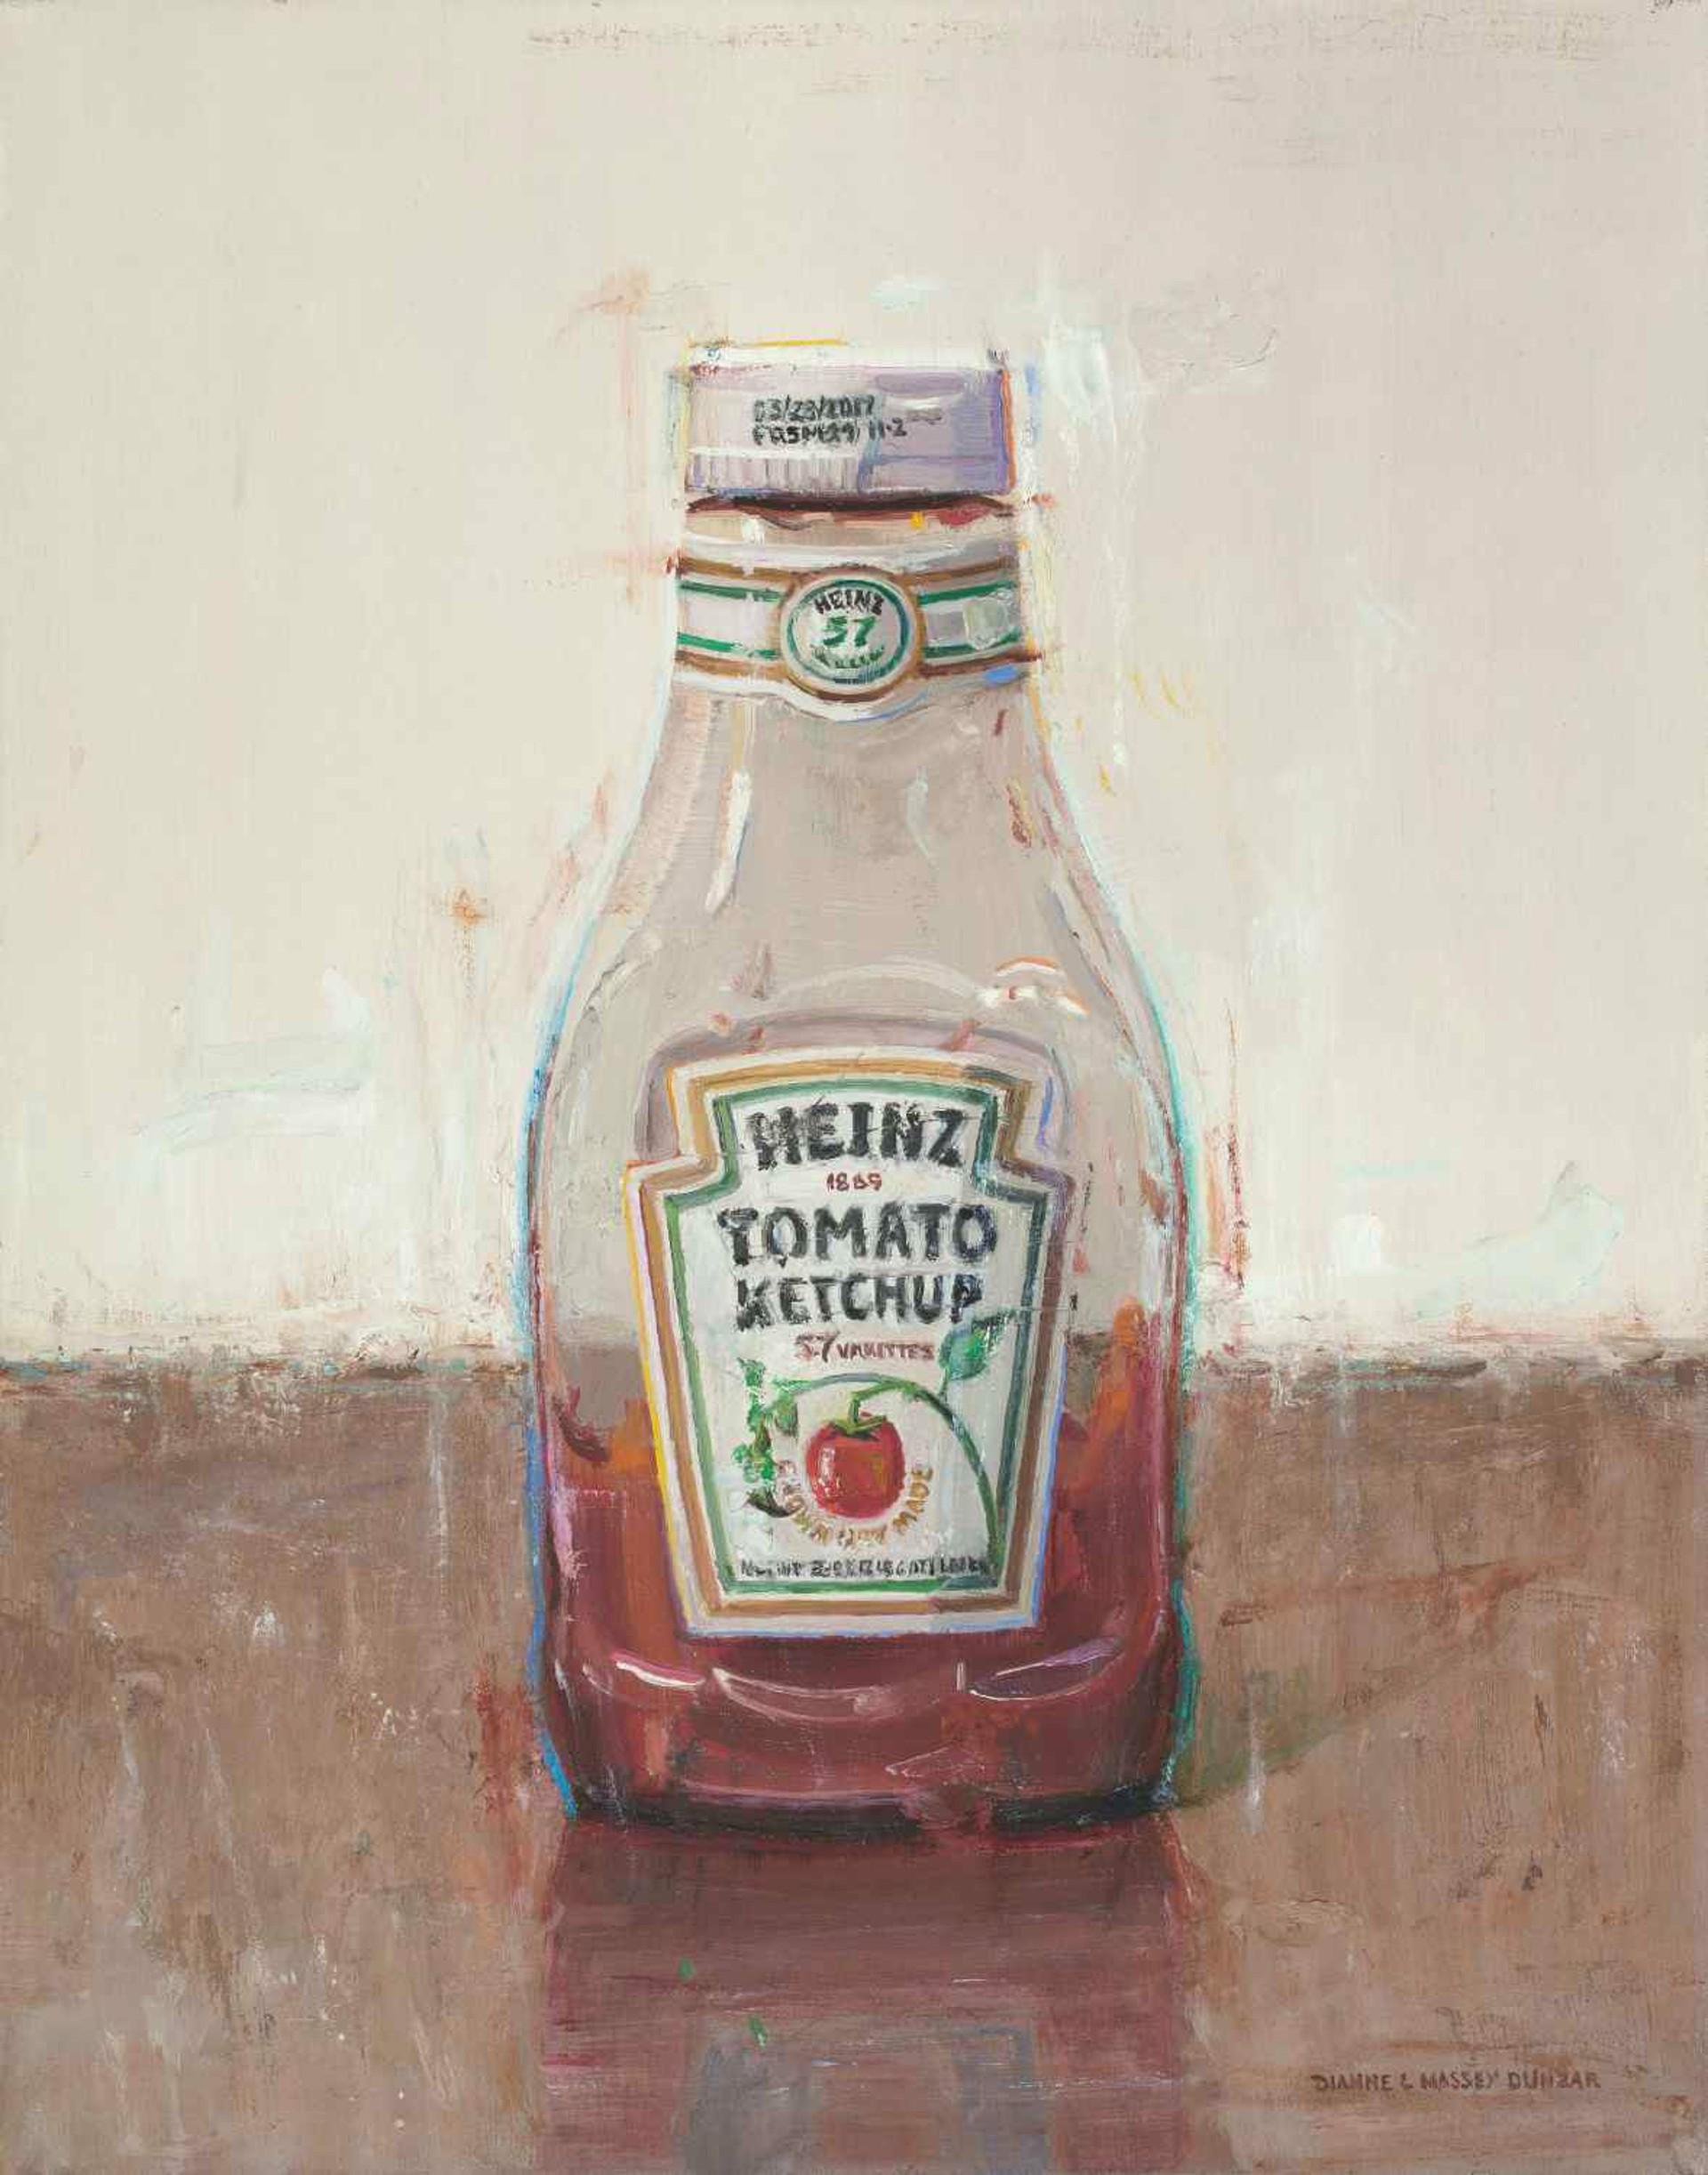 Ketchup by Dianne L Massey Dunbar